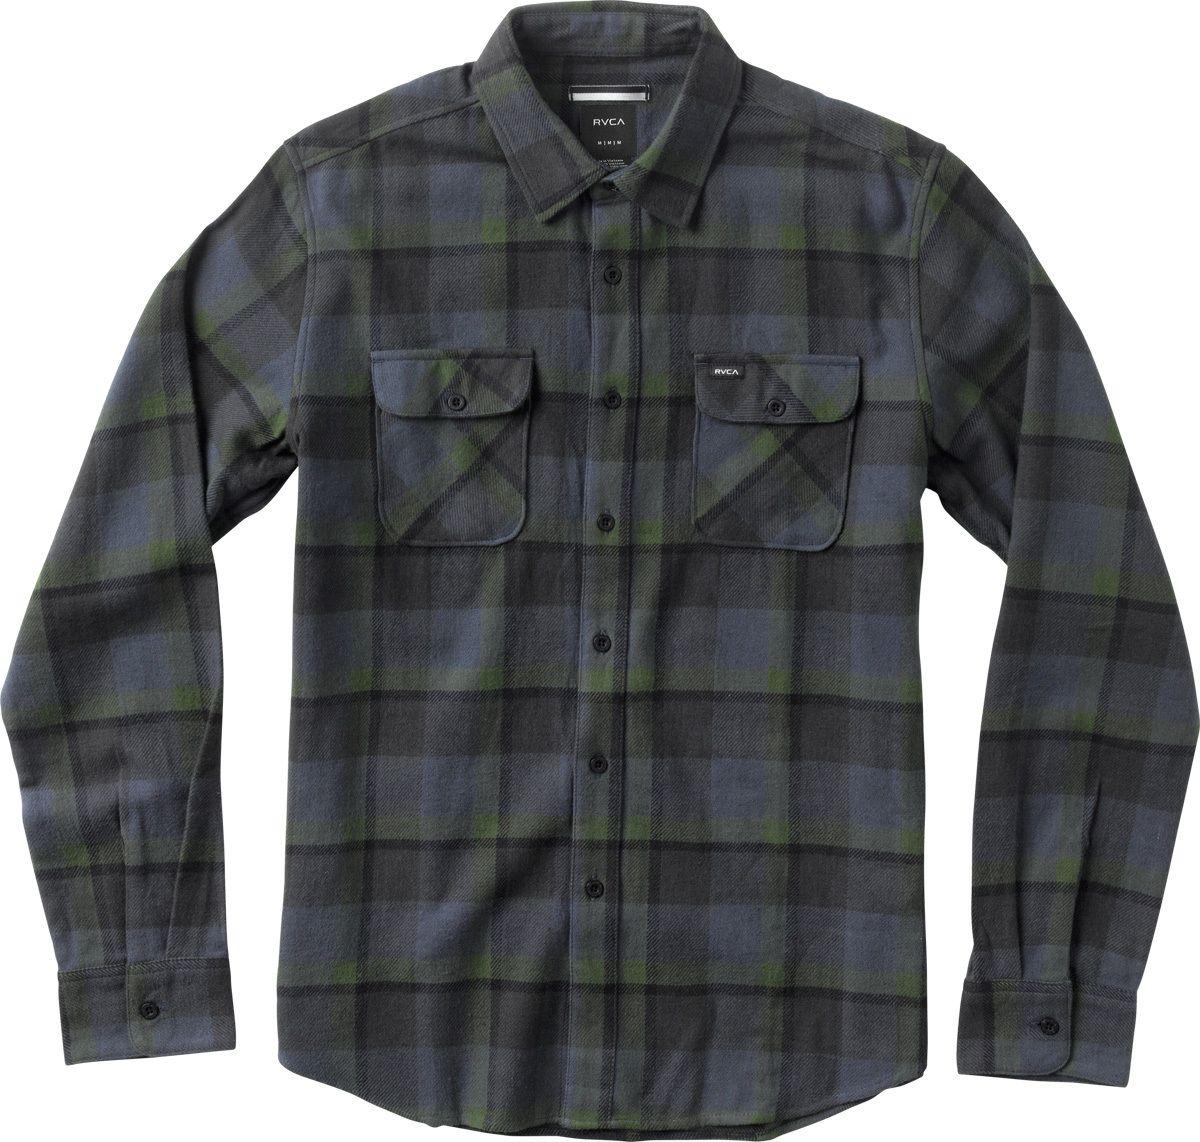 Telltale flannel long sleeve shirt rvca canada shirts